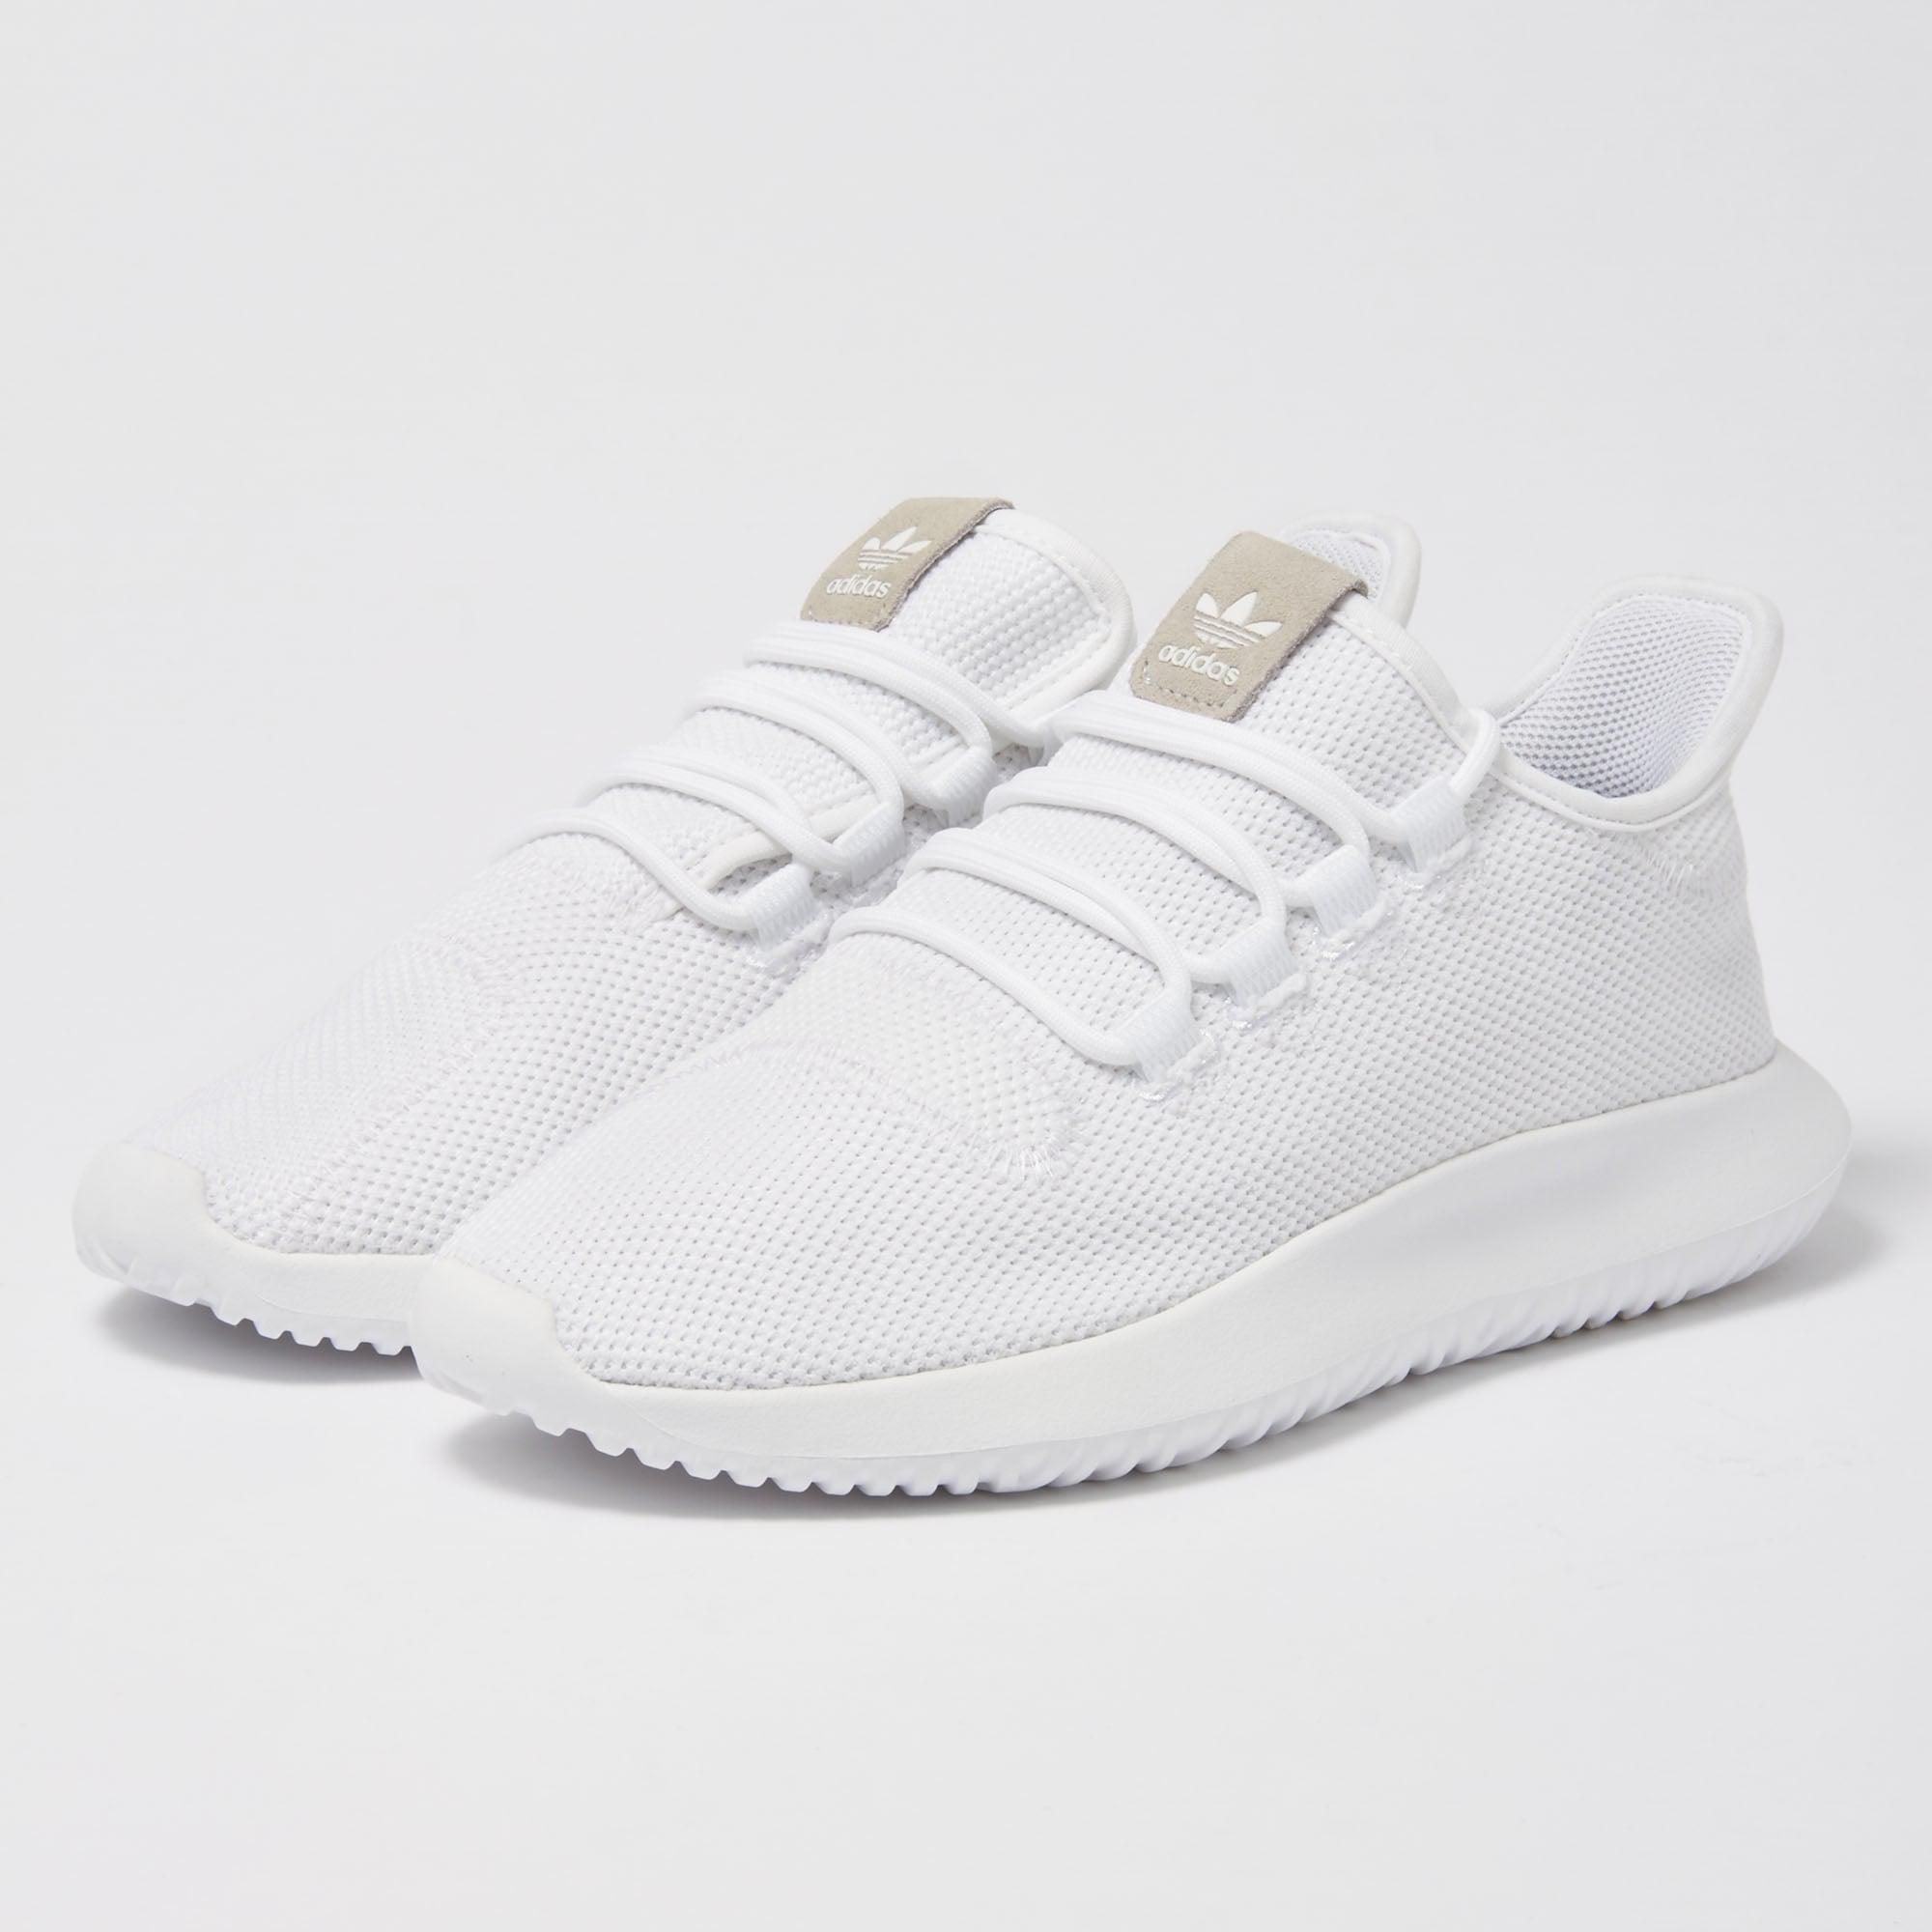 Lyst - adidas Originals Tubular Shadow - Ftw White in White 42388f76f